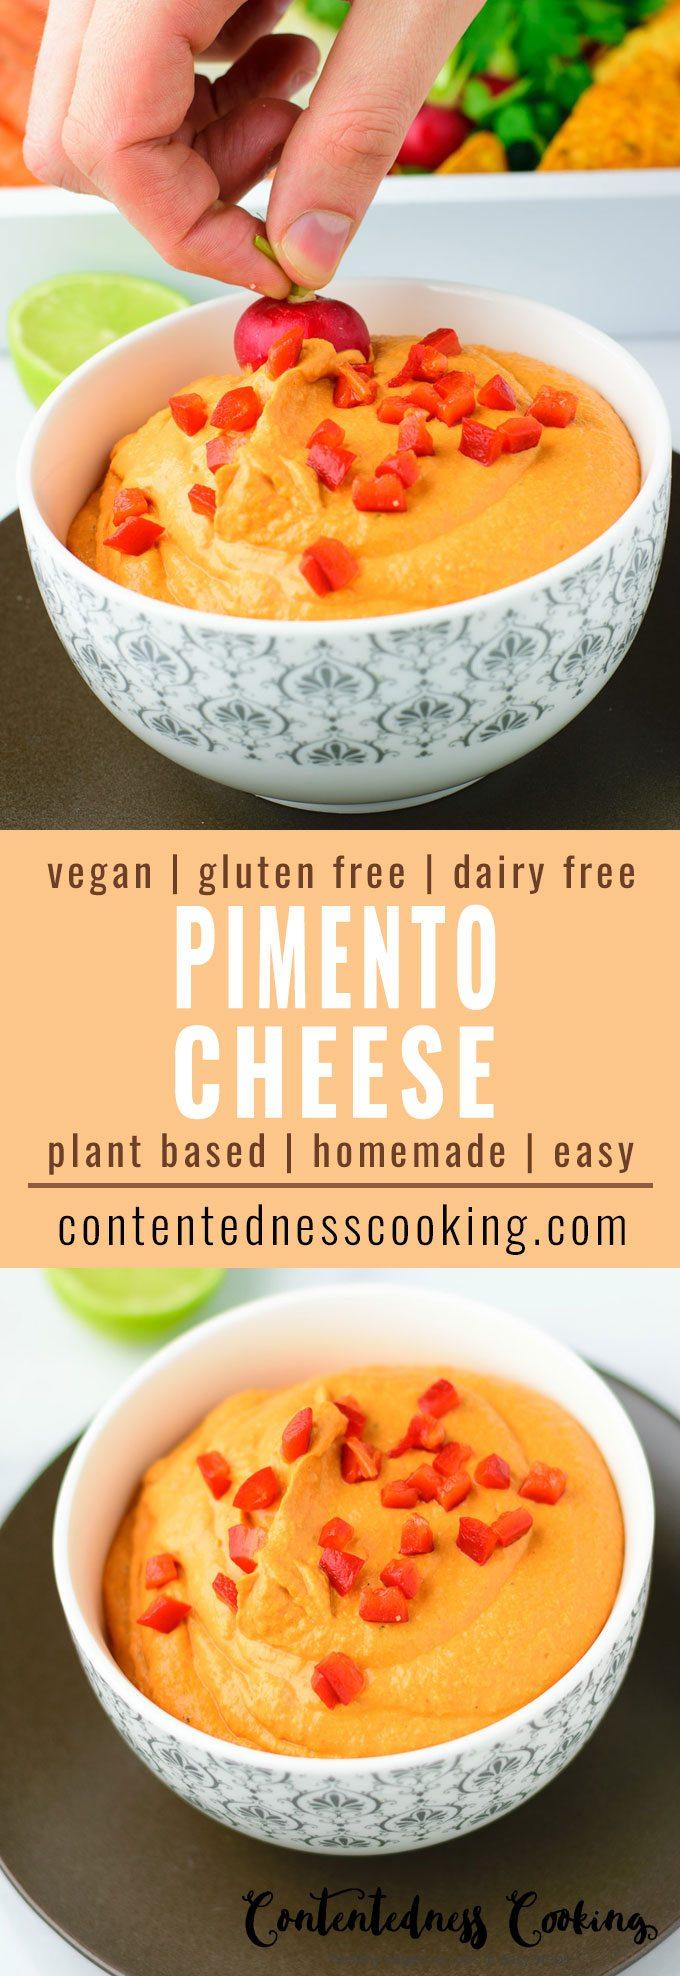 Easy Vegan Pimento Cheese   #vegan #glutenfree #contentednesscooking #plantbased #dairyfree